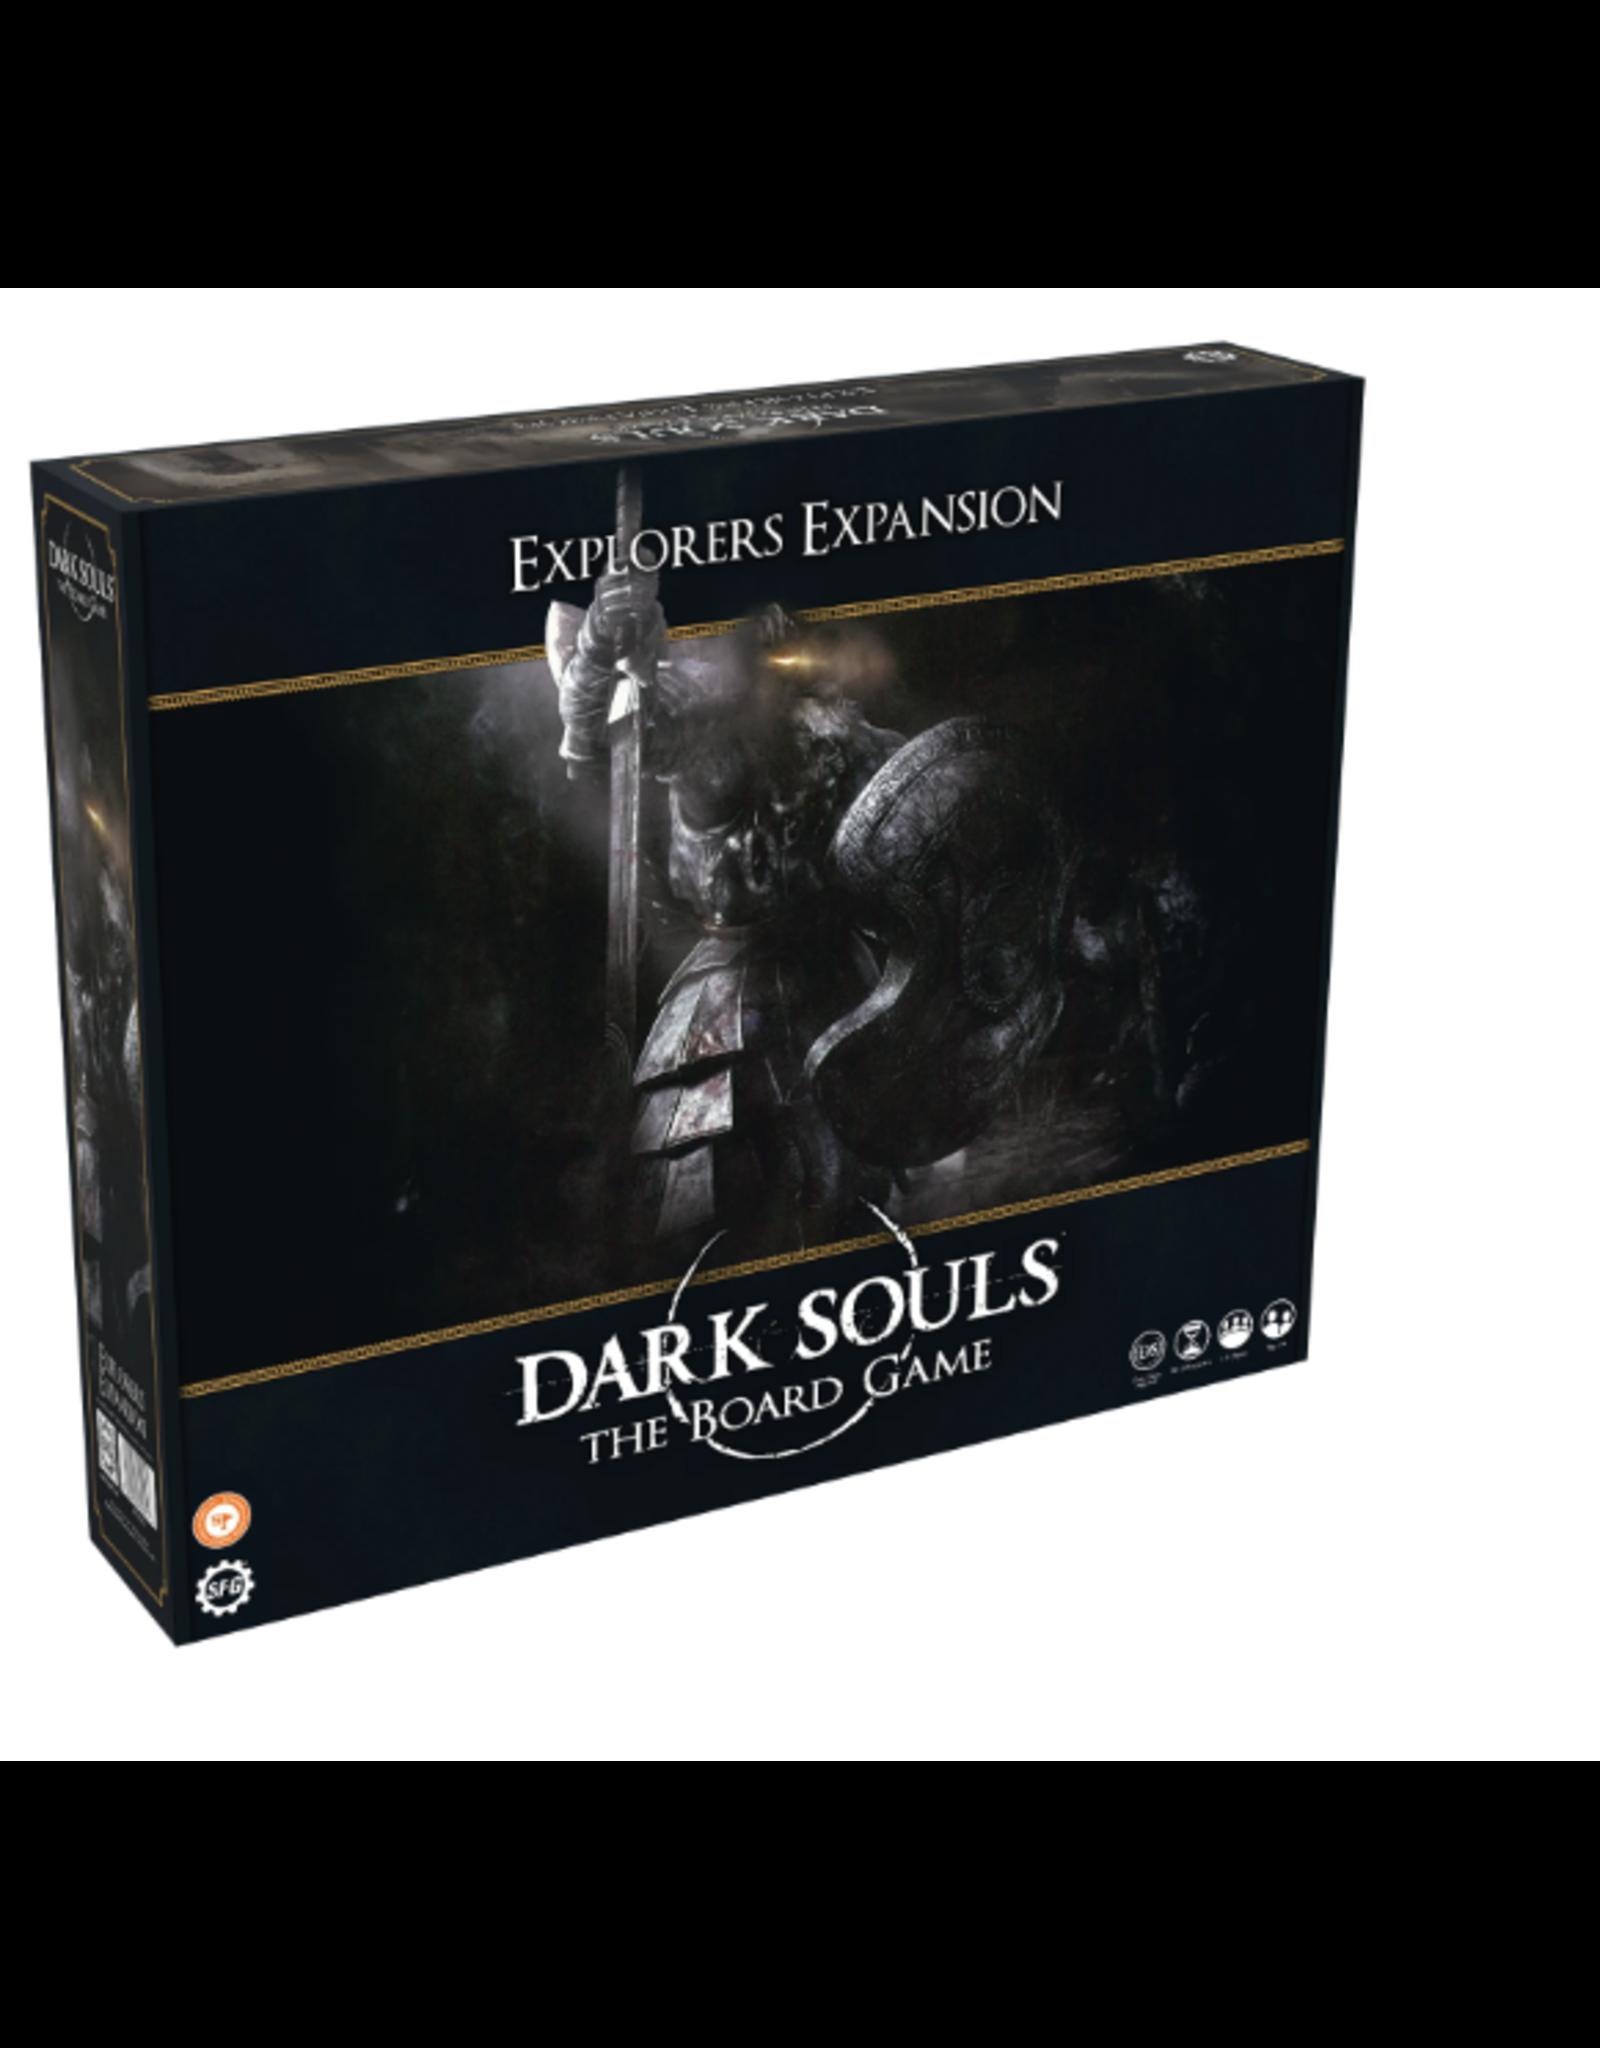 Steamforged Dark Souls: Explorers Expansion